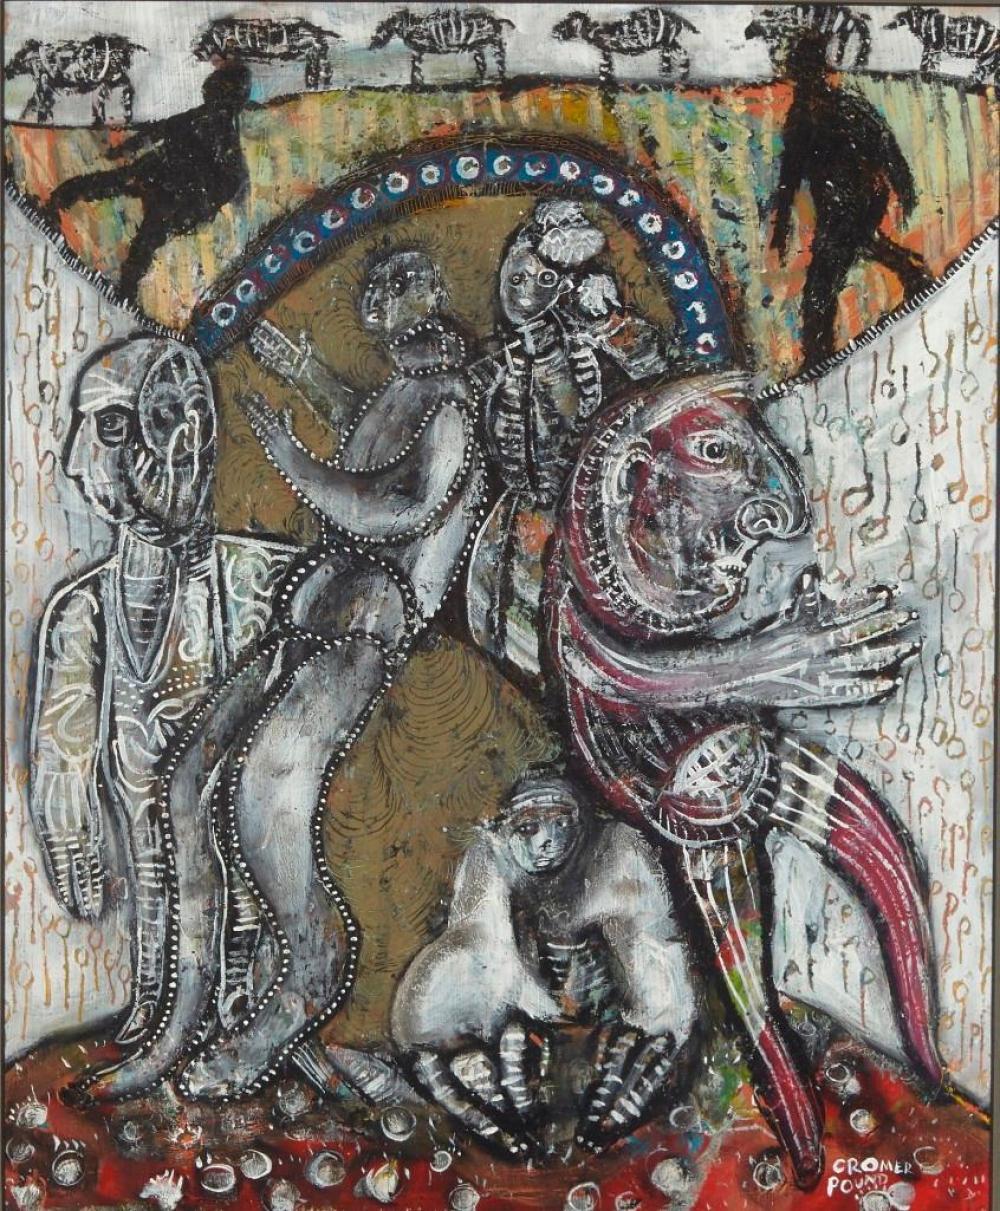 J.J. Cromer  Outsider Artist - 2 works on paper